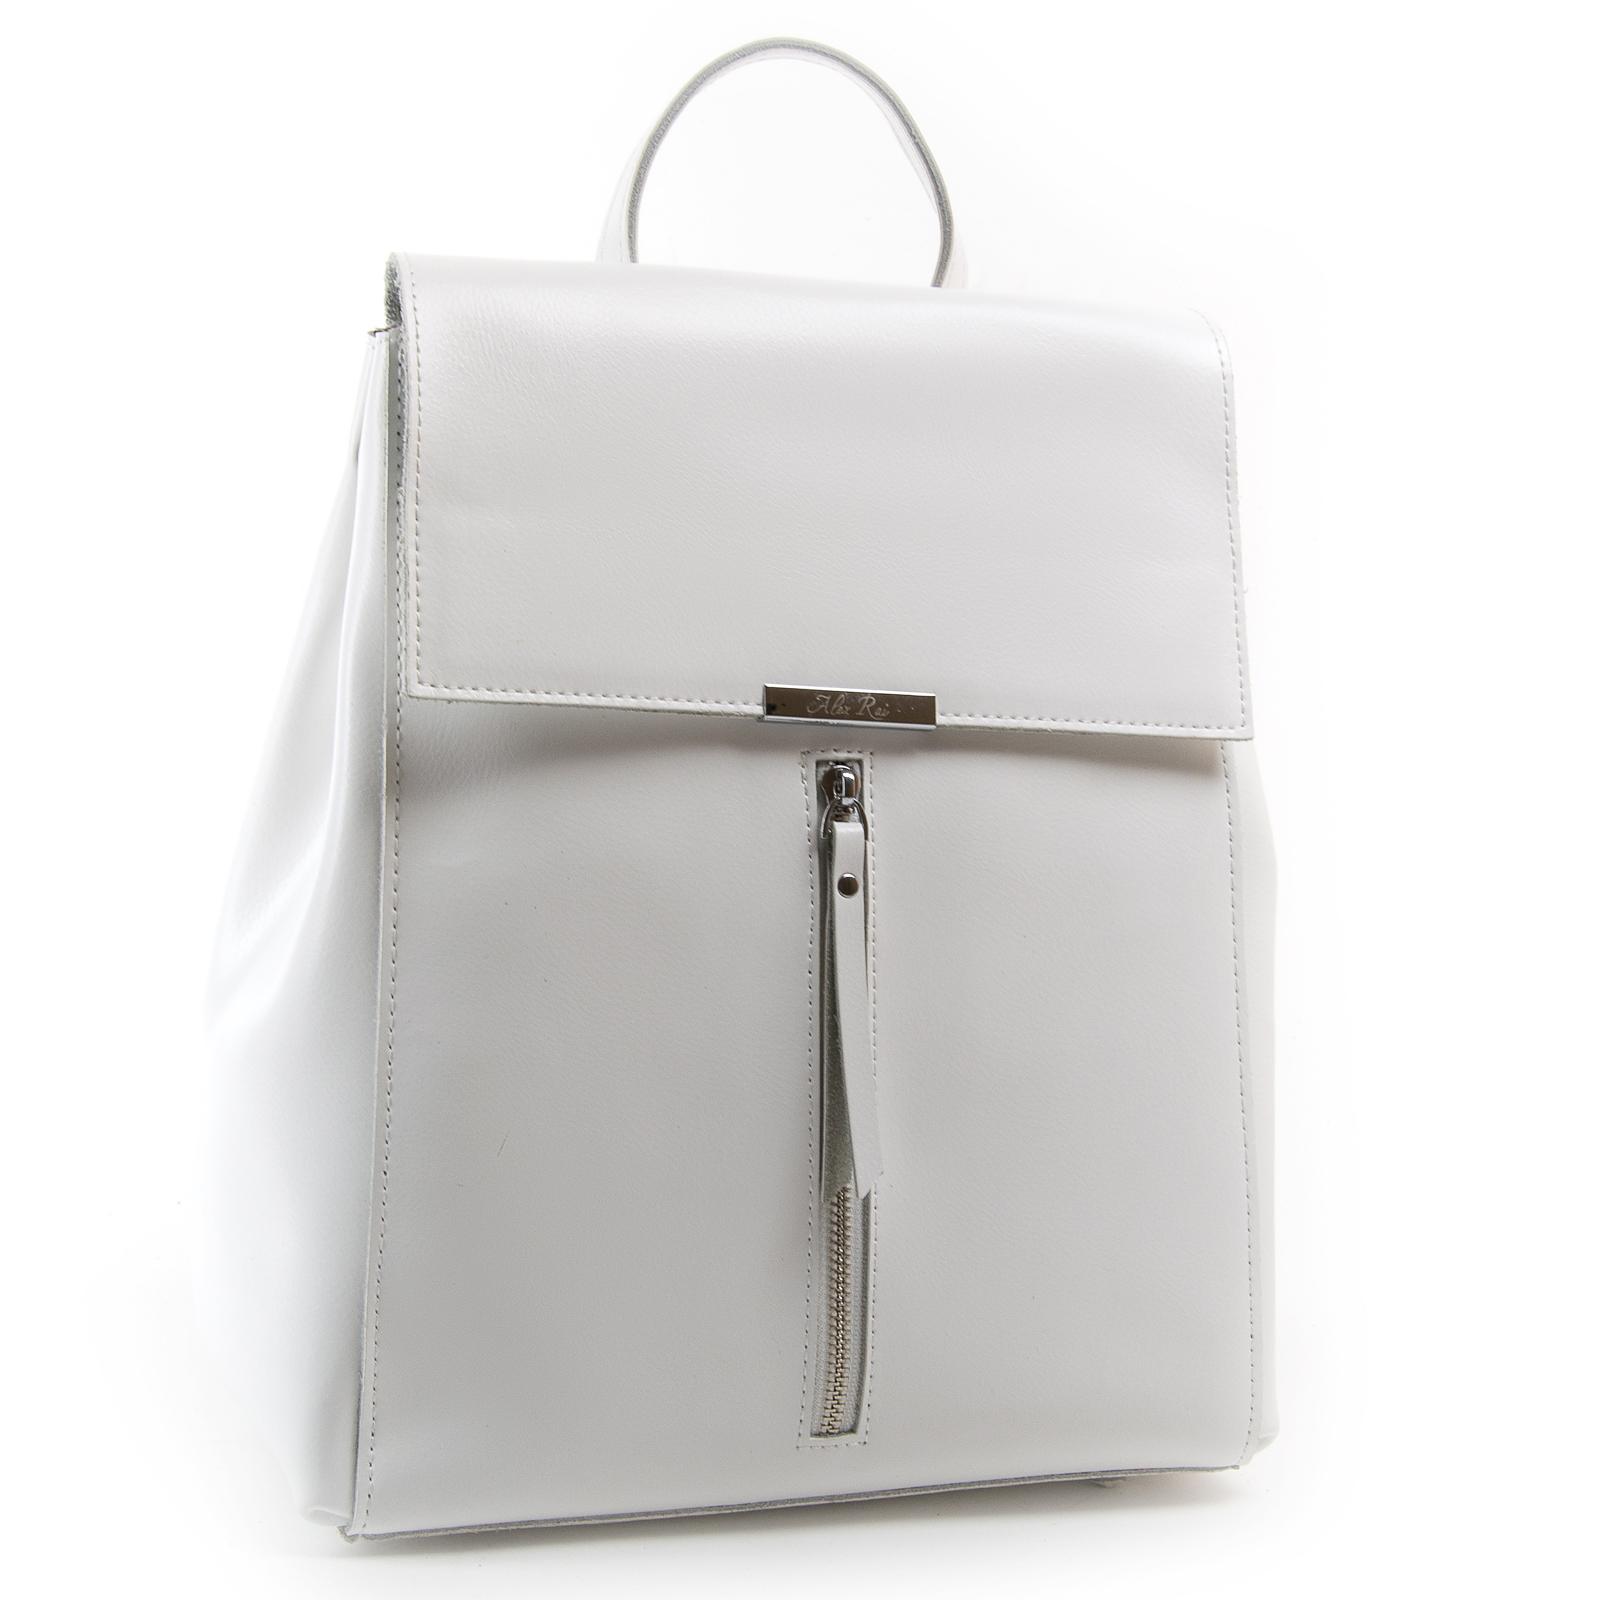 Сумка Женская Рюкзак кожа ALEX RAI 03-01 373 white